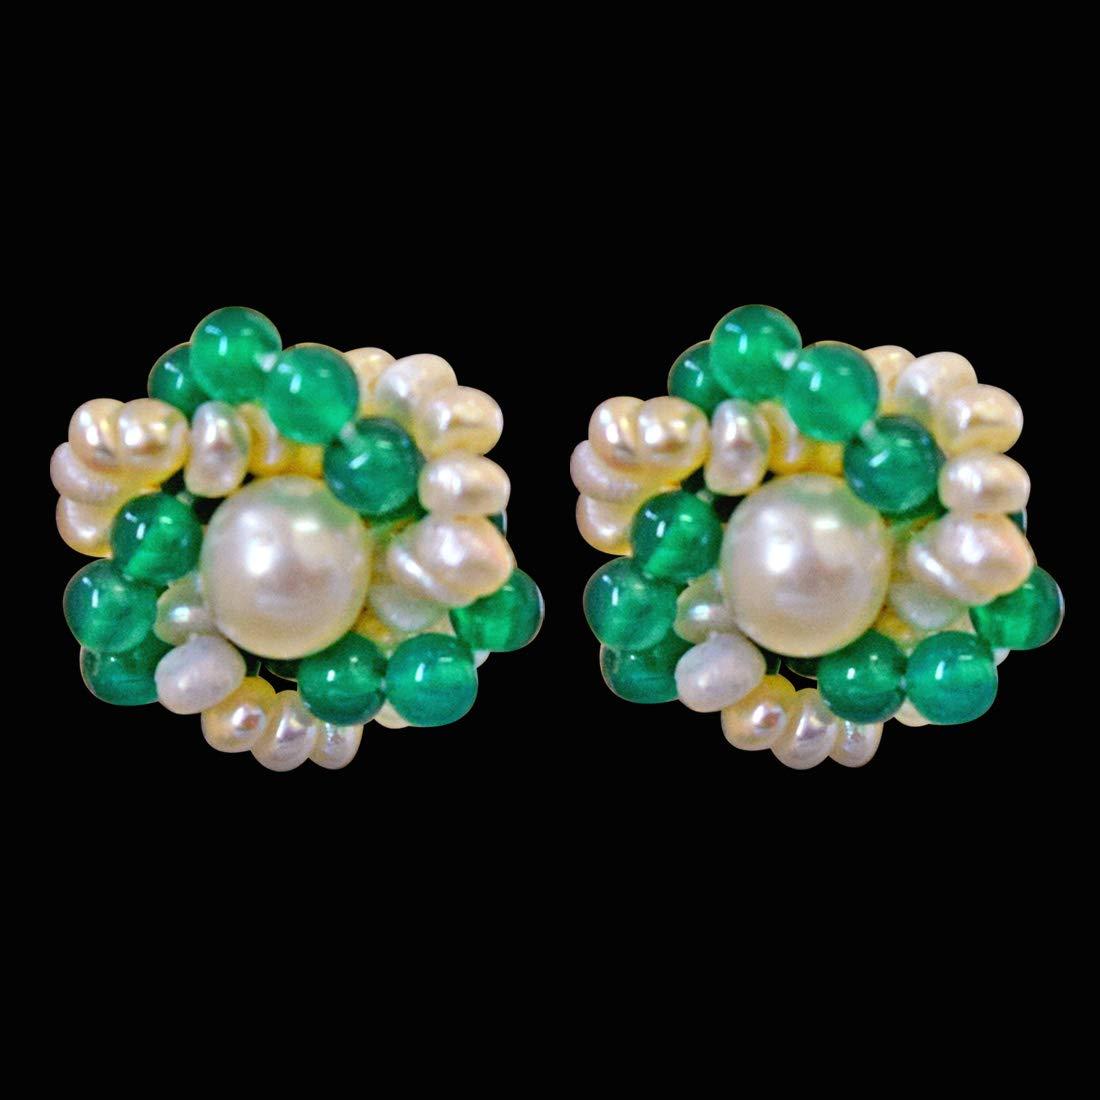 Wonder Girl - Traditional Real Freshwater Pearl, Green Onyx & Gold Plated Kuda Jodi Earrings for Women (SE35)